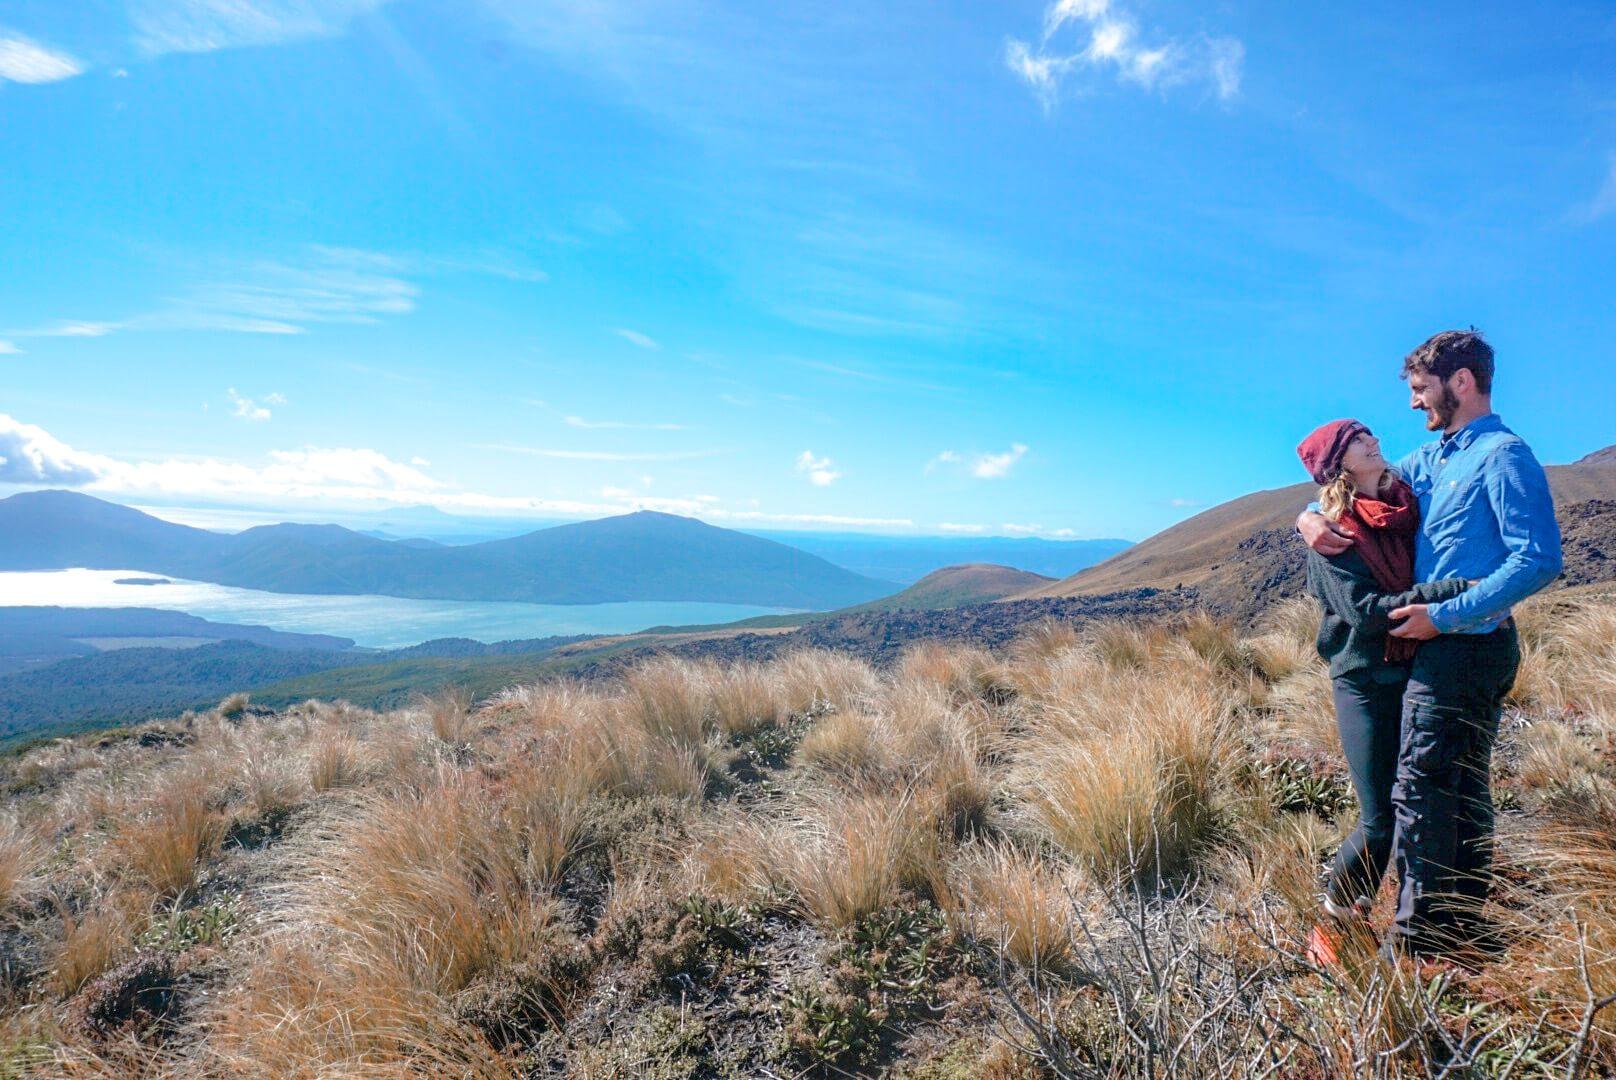 niveau profil randonnée Tongariro alpine crossing